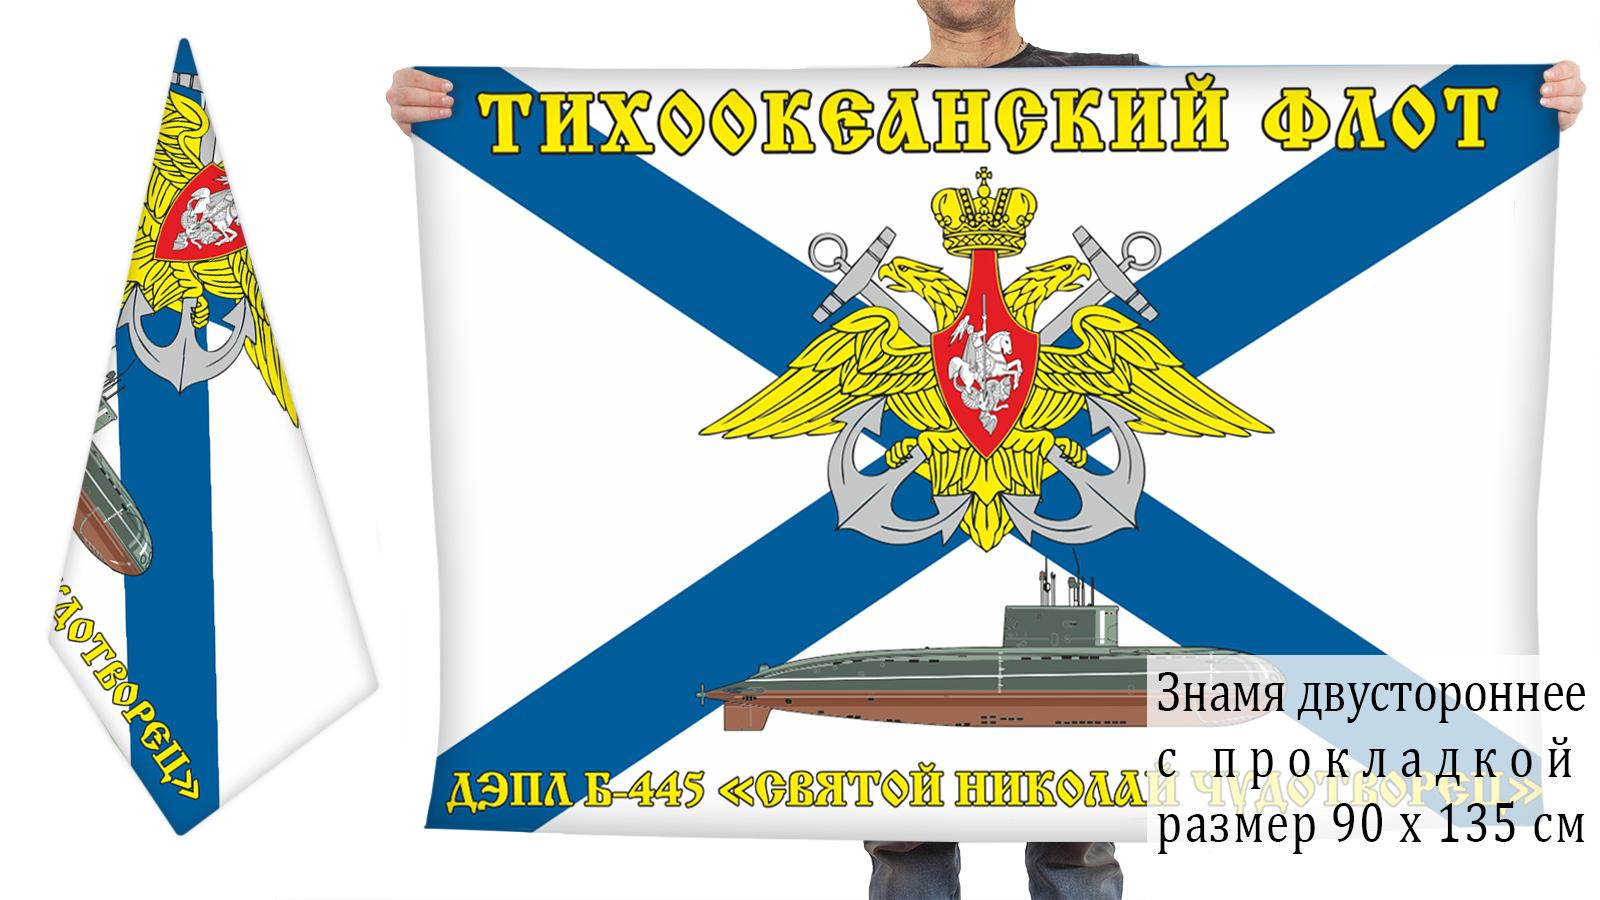 Флаг ВМФ Б-445 Святой Николай Чудотворец Тихоокеанский флот